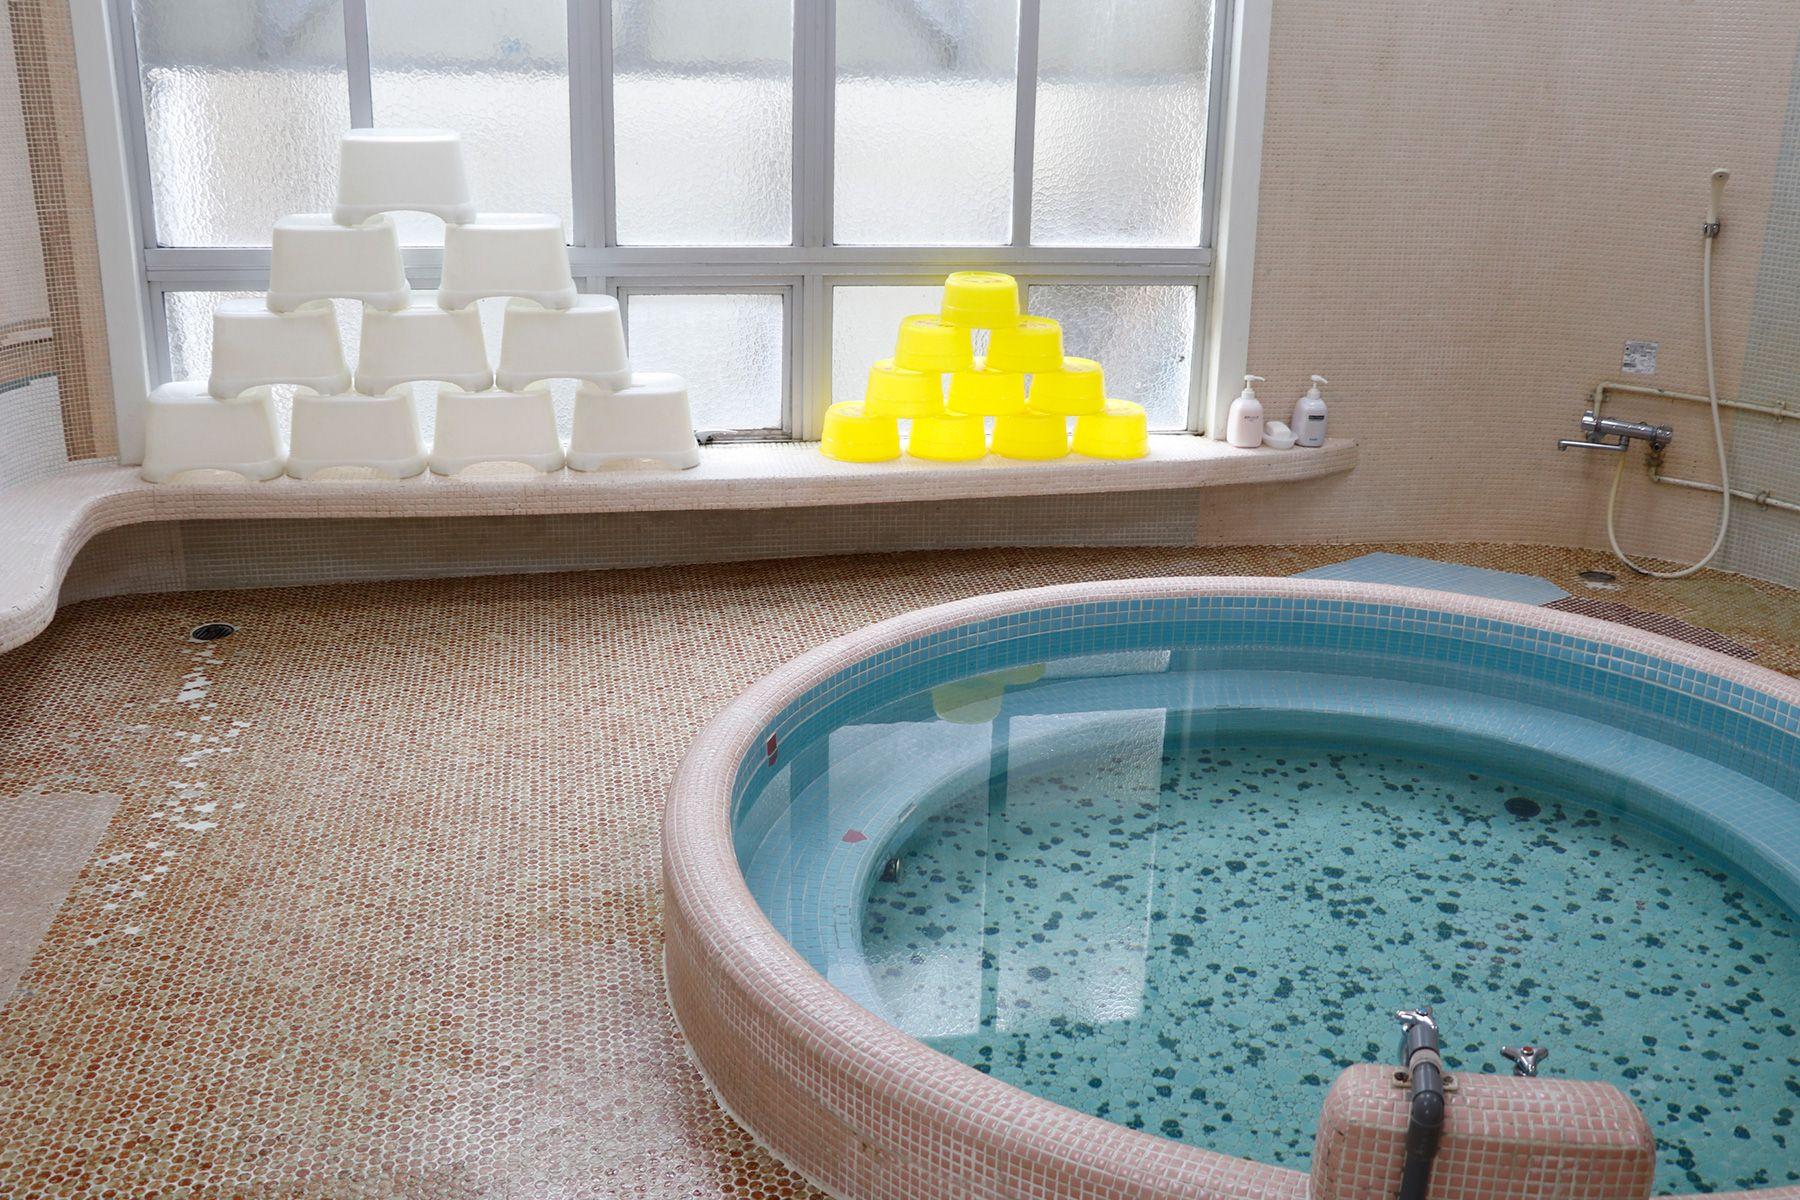 HOMEIKAN 森川別館/旅館 (ホウメイカン)タイル張りのお風呂(ローマ風呂)